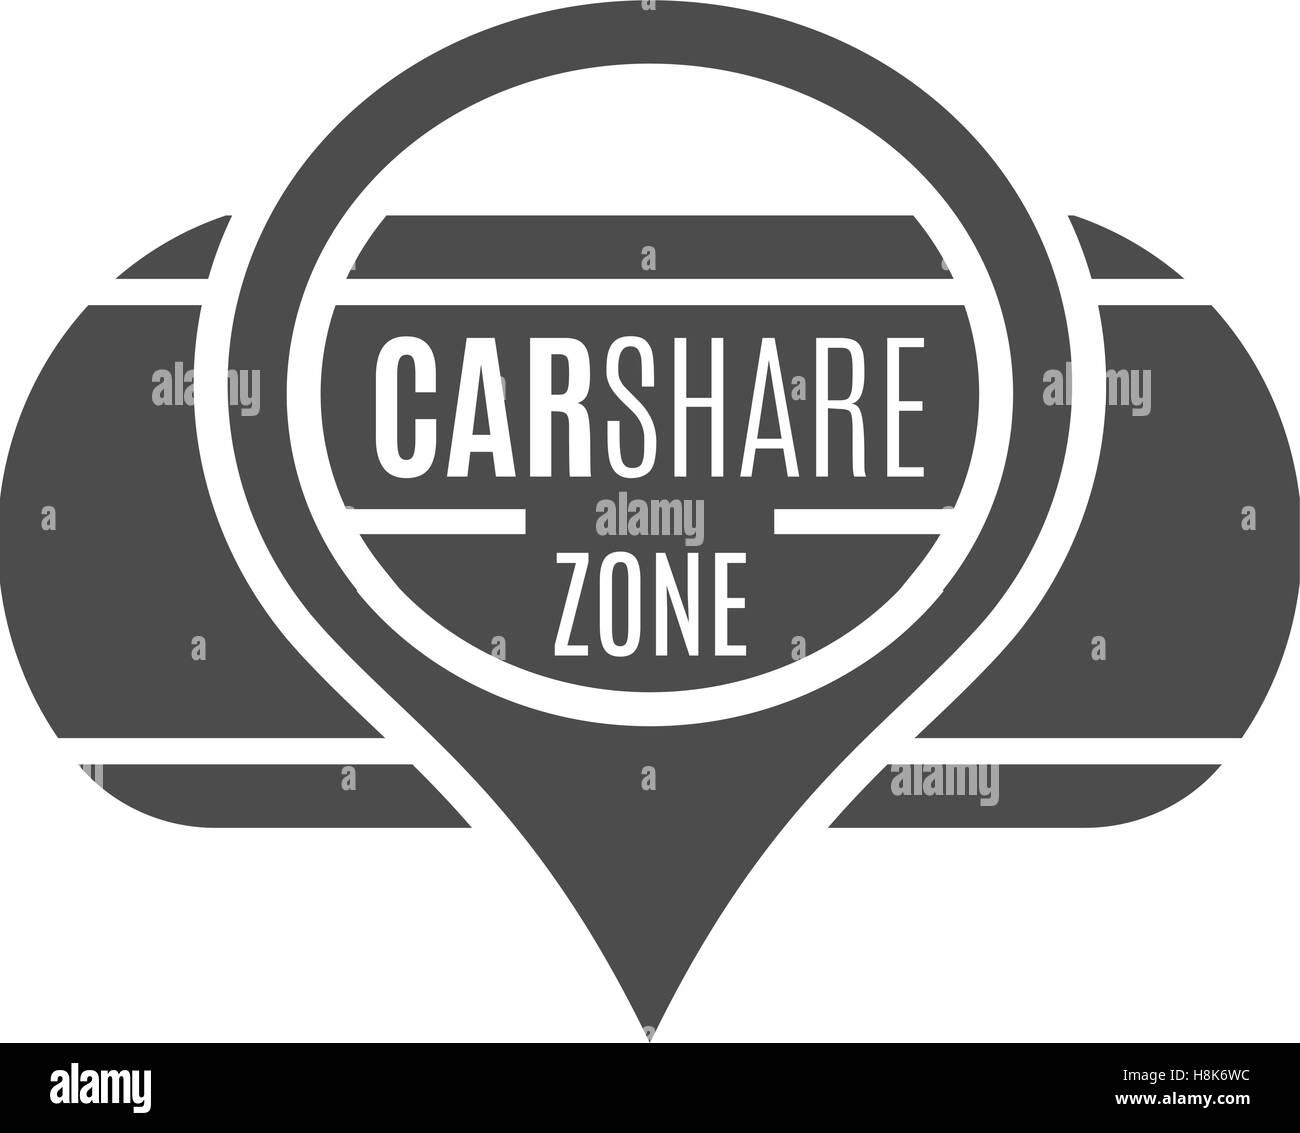 Car Share Logo Design Car Sharing Vector Concept Collective Usage